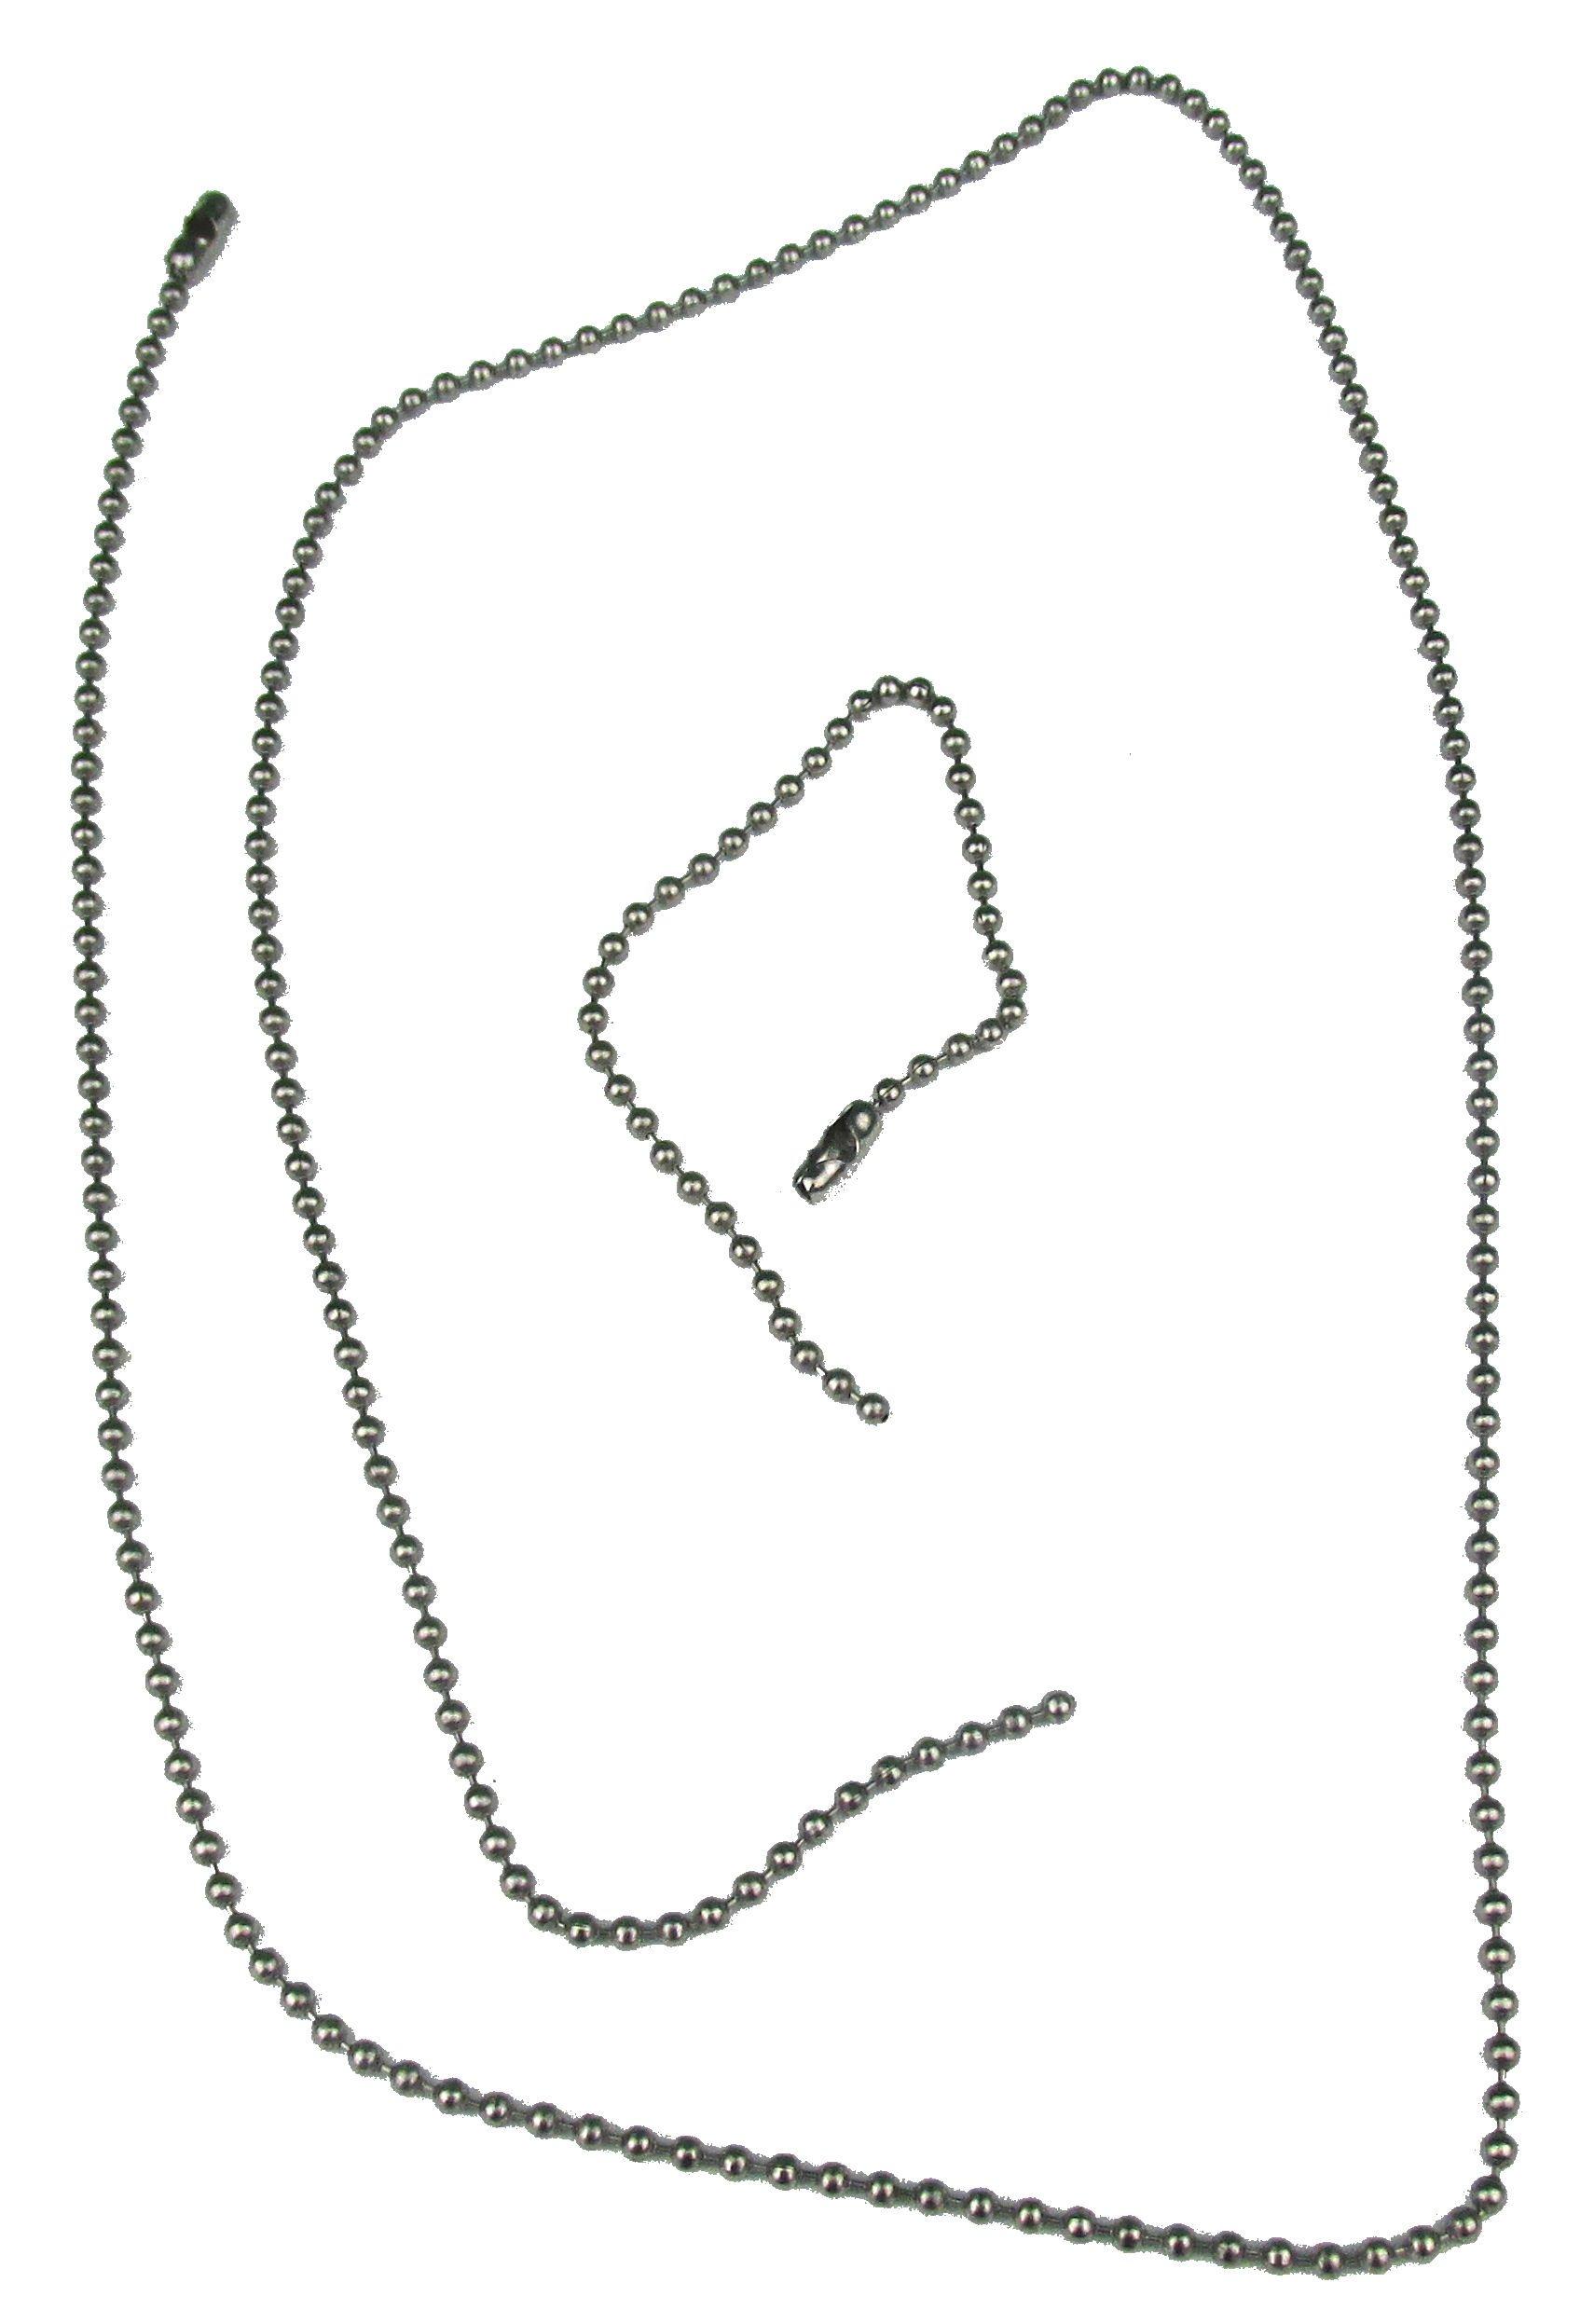 Dog Tag Chain Set - Silver - Quantity 1,000